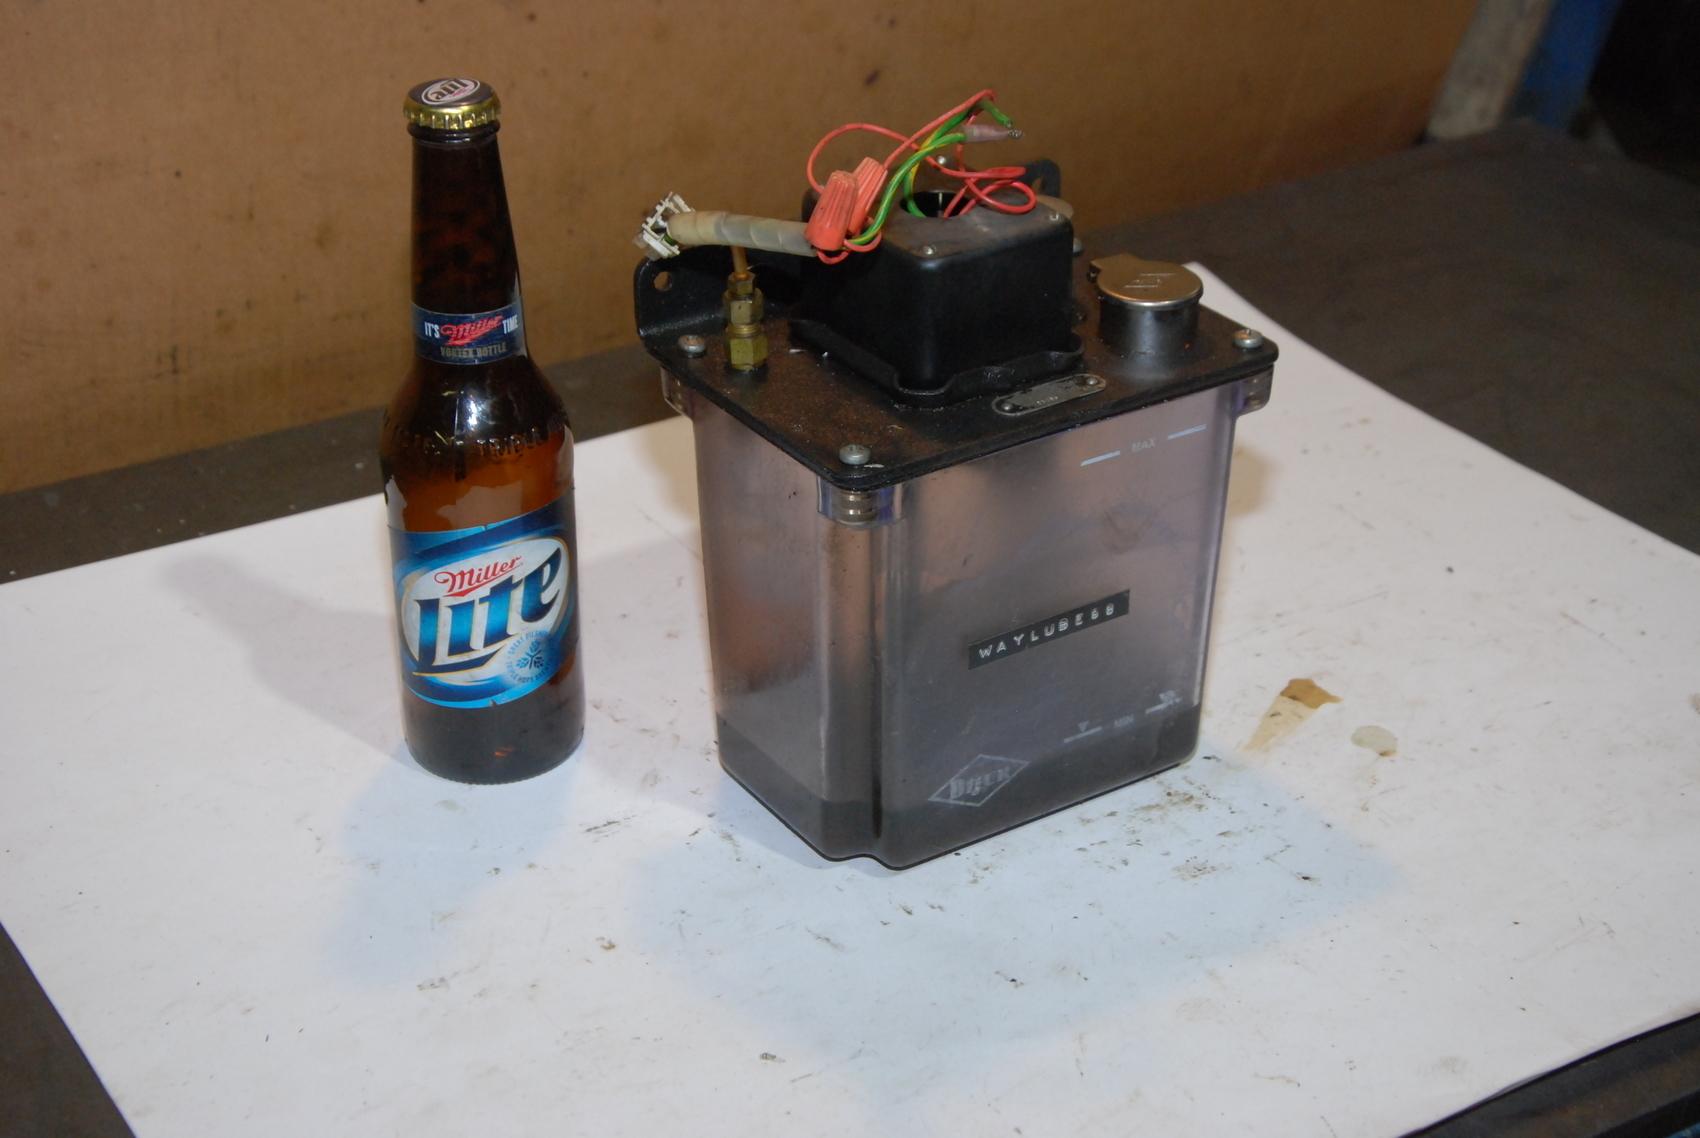 Bijur D3095 Lubricant Pump